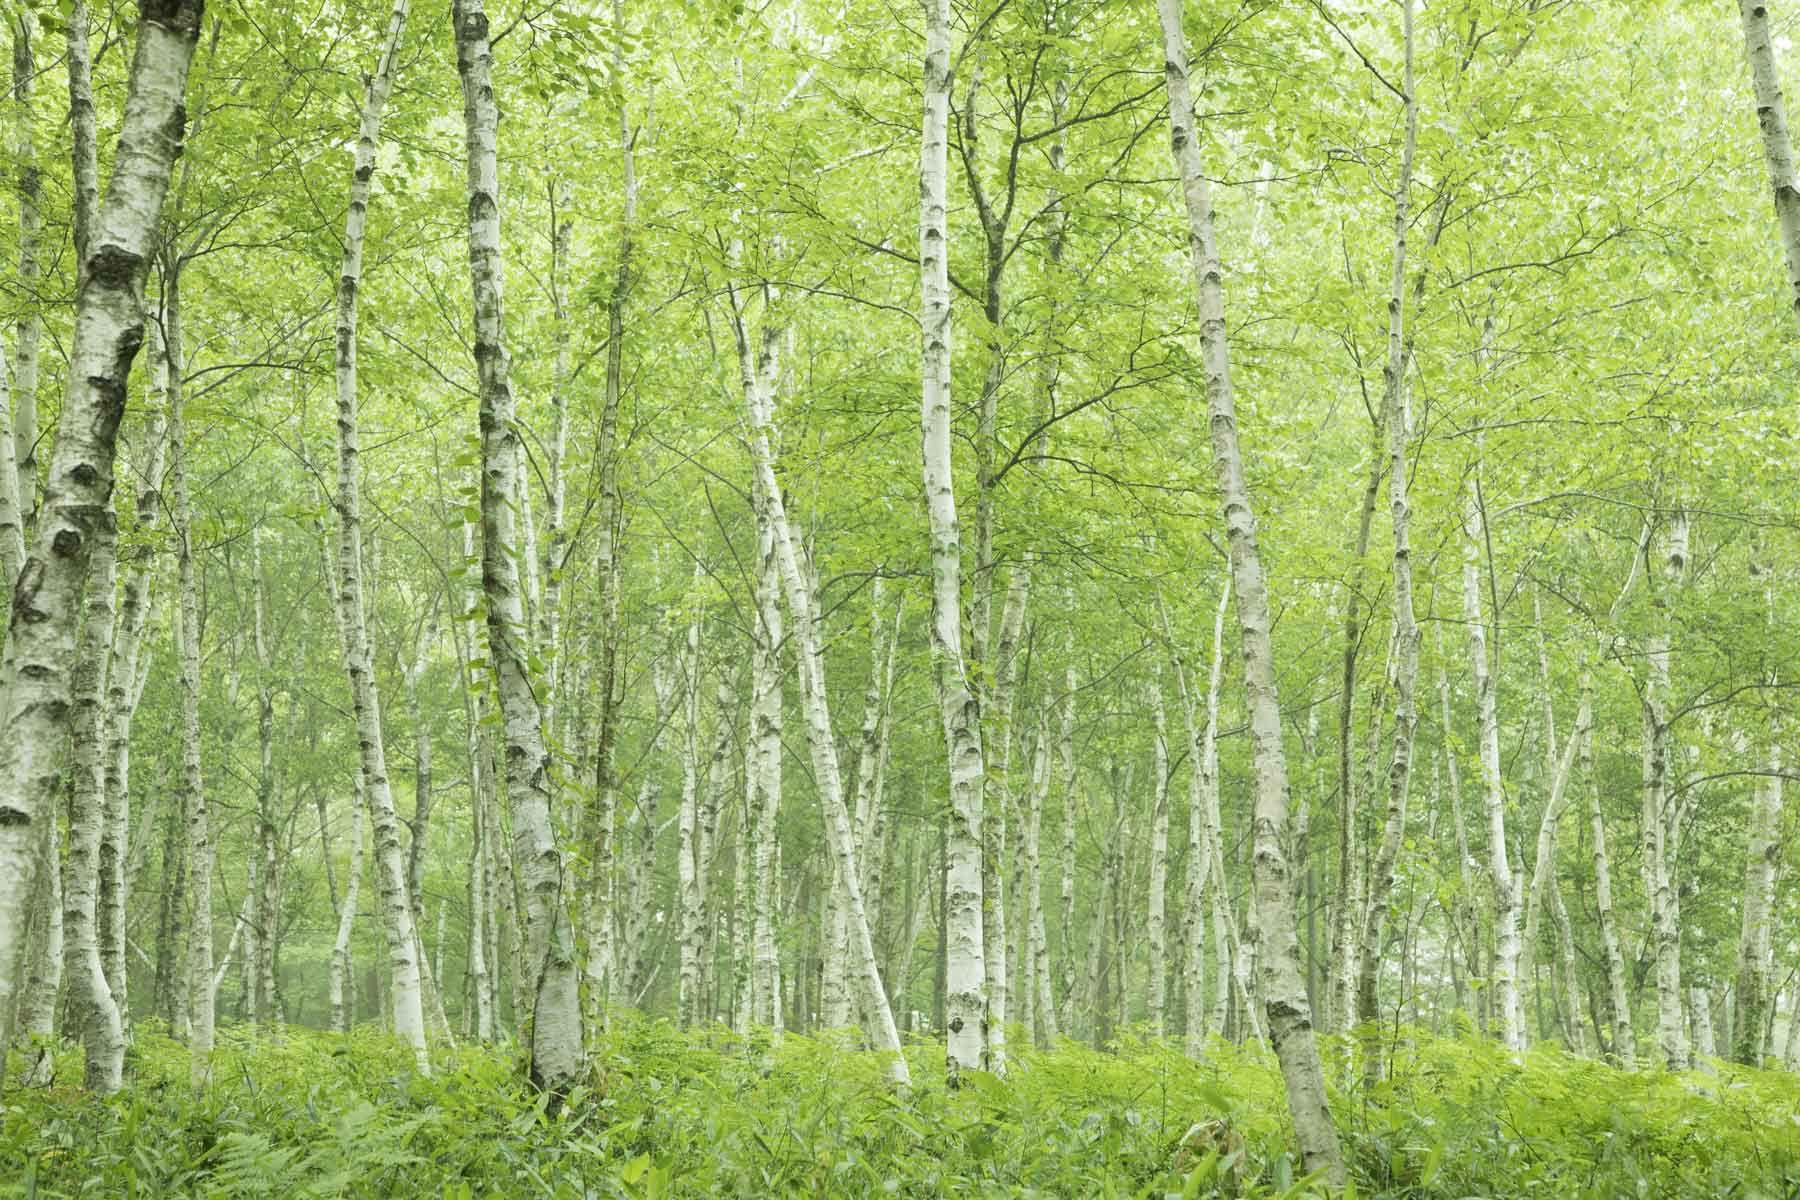 Distinguishing Between Hardwood And Softwood Trees